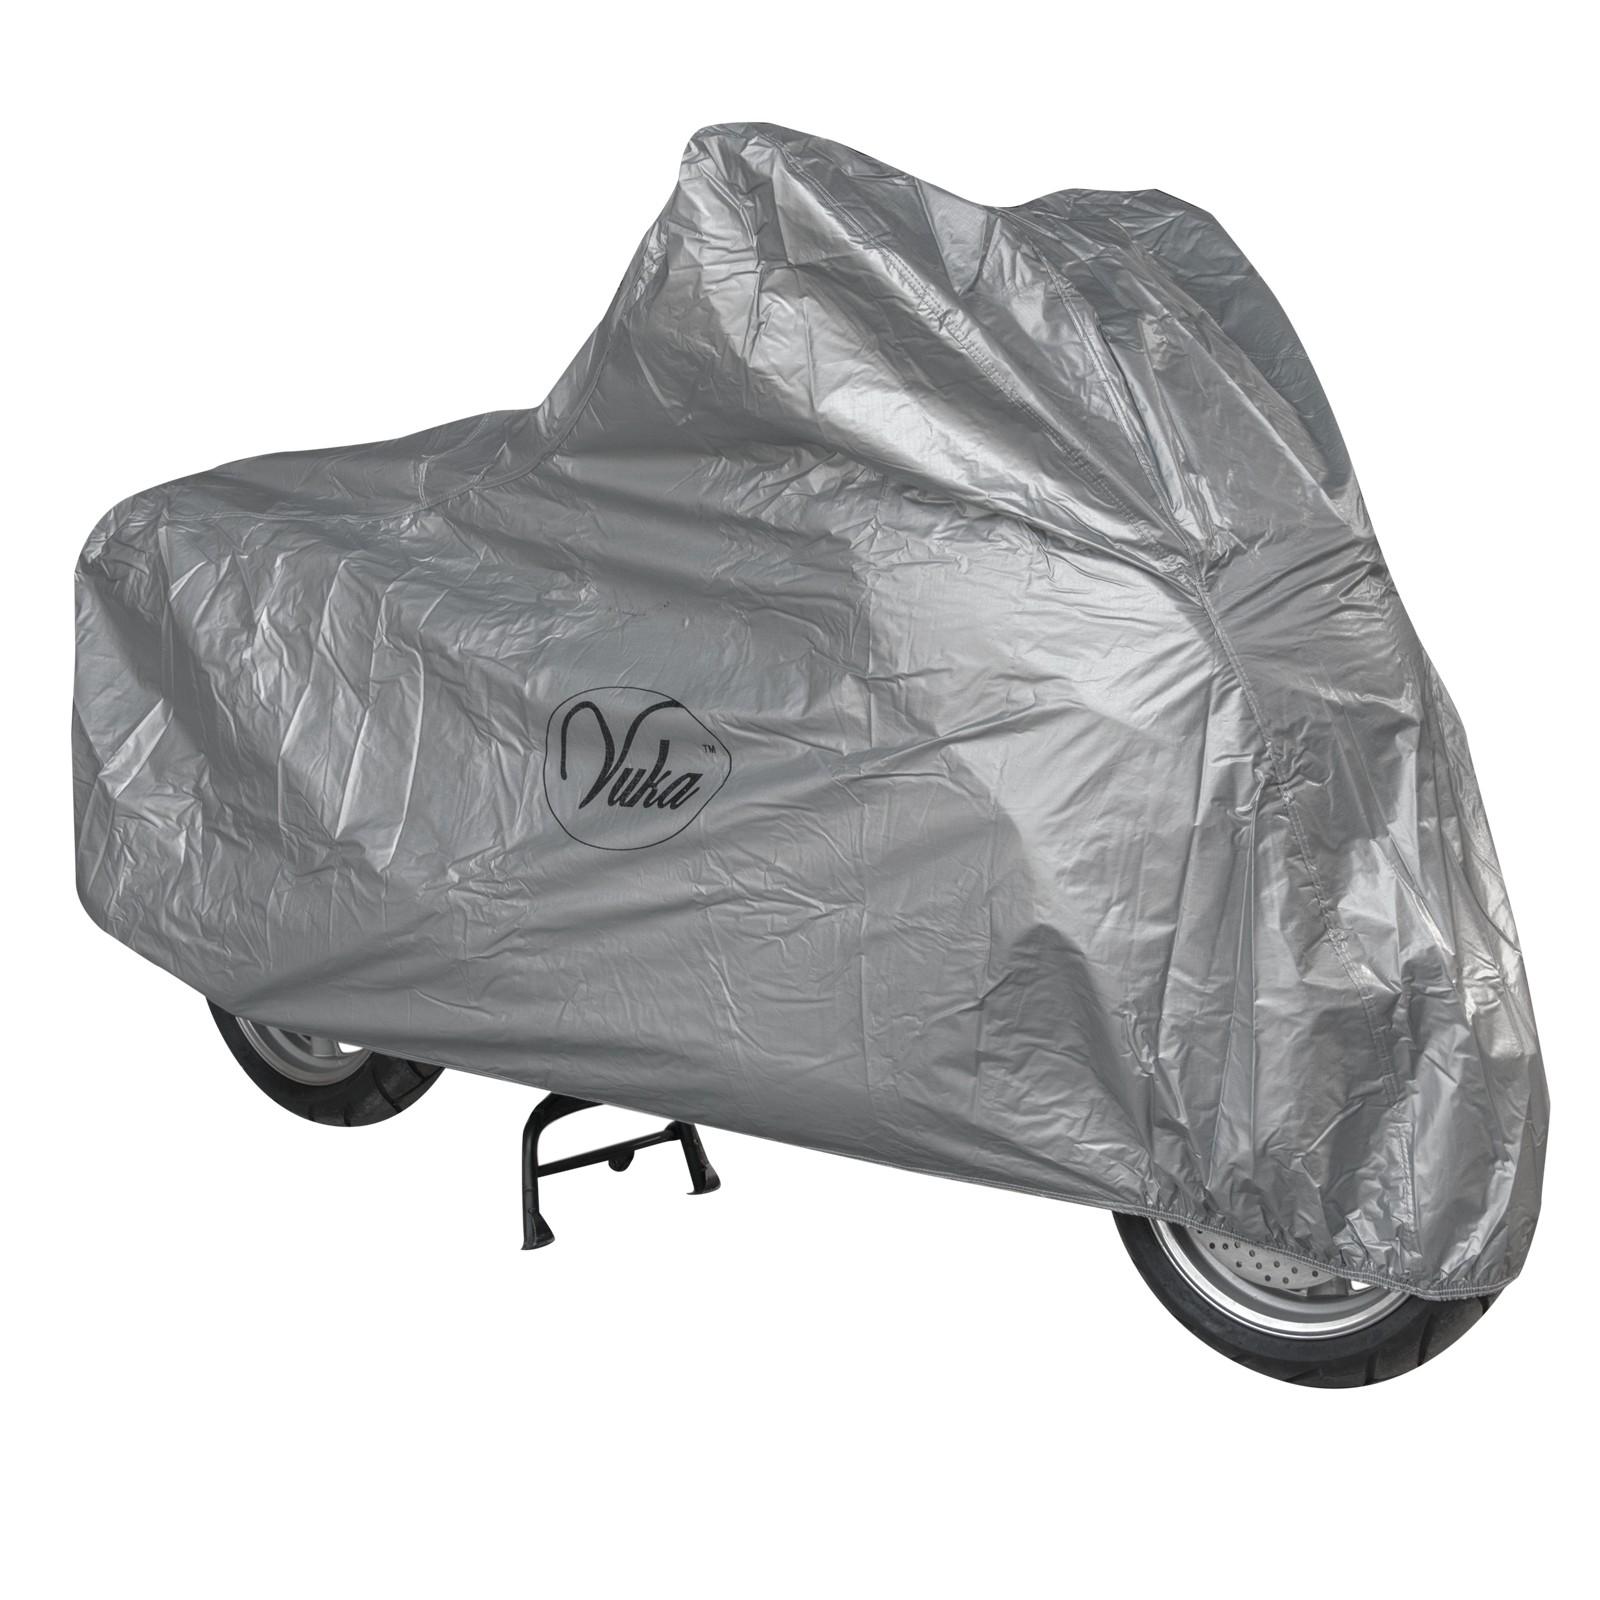 Telo Copri Moto Scooter Naked Customo Impermeabile PVC Resistente Universale